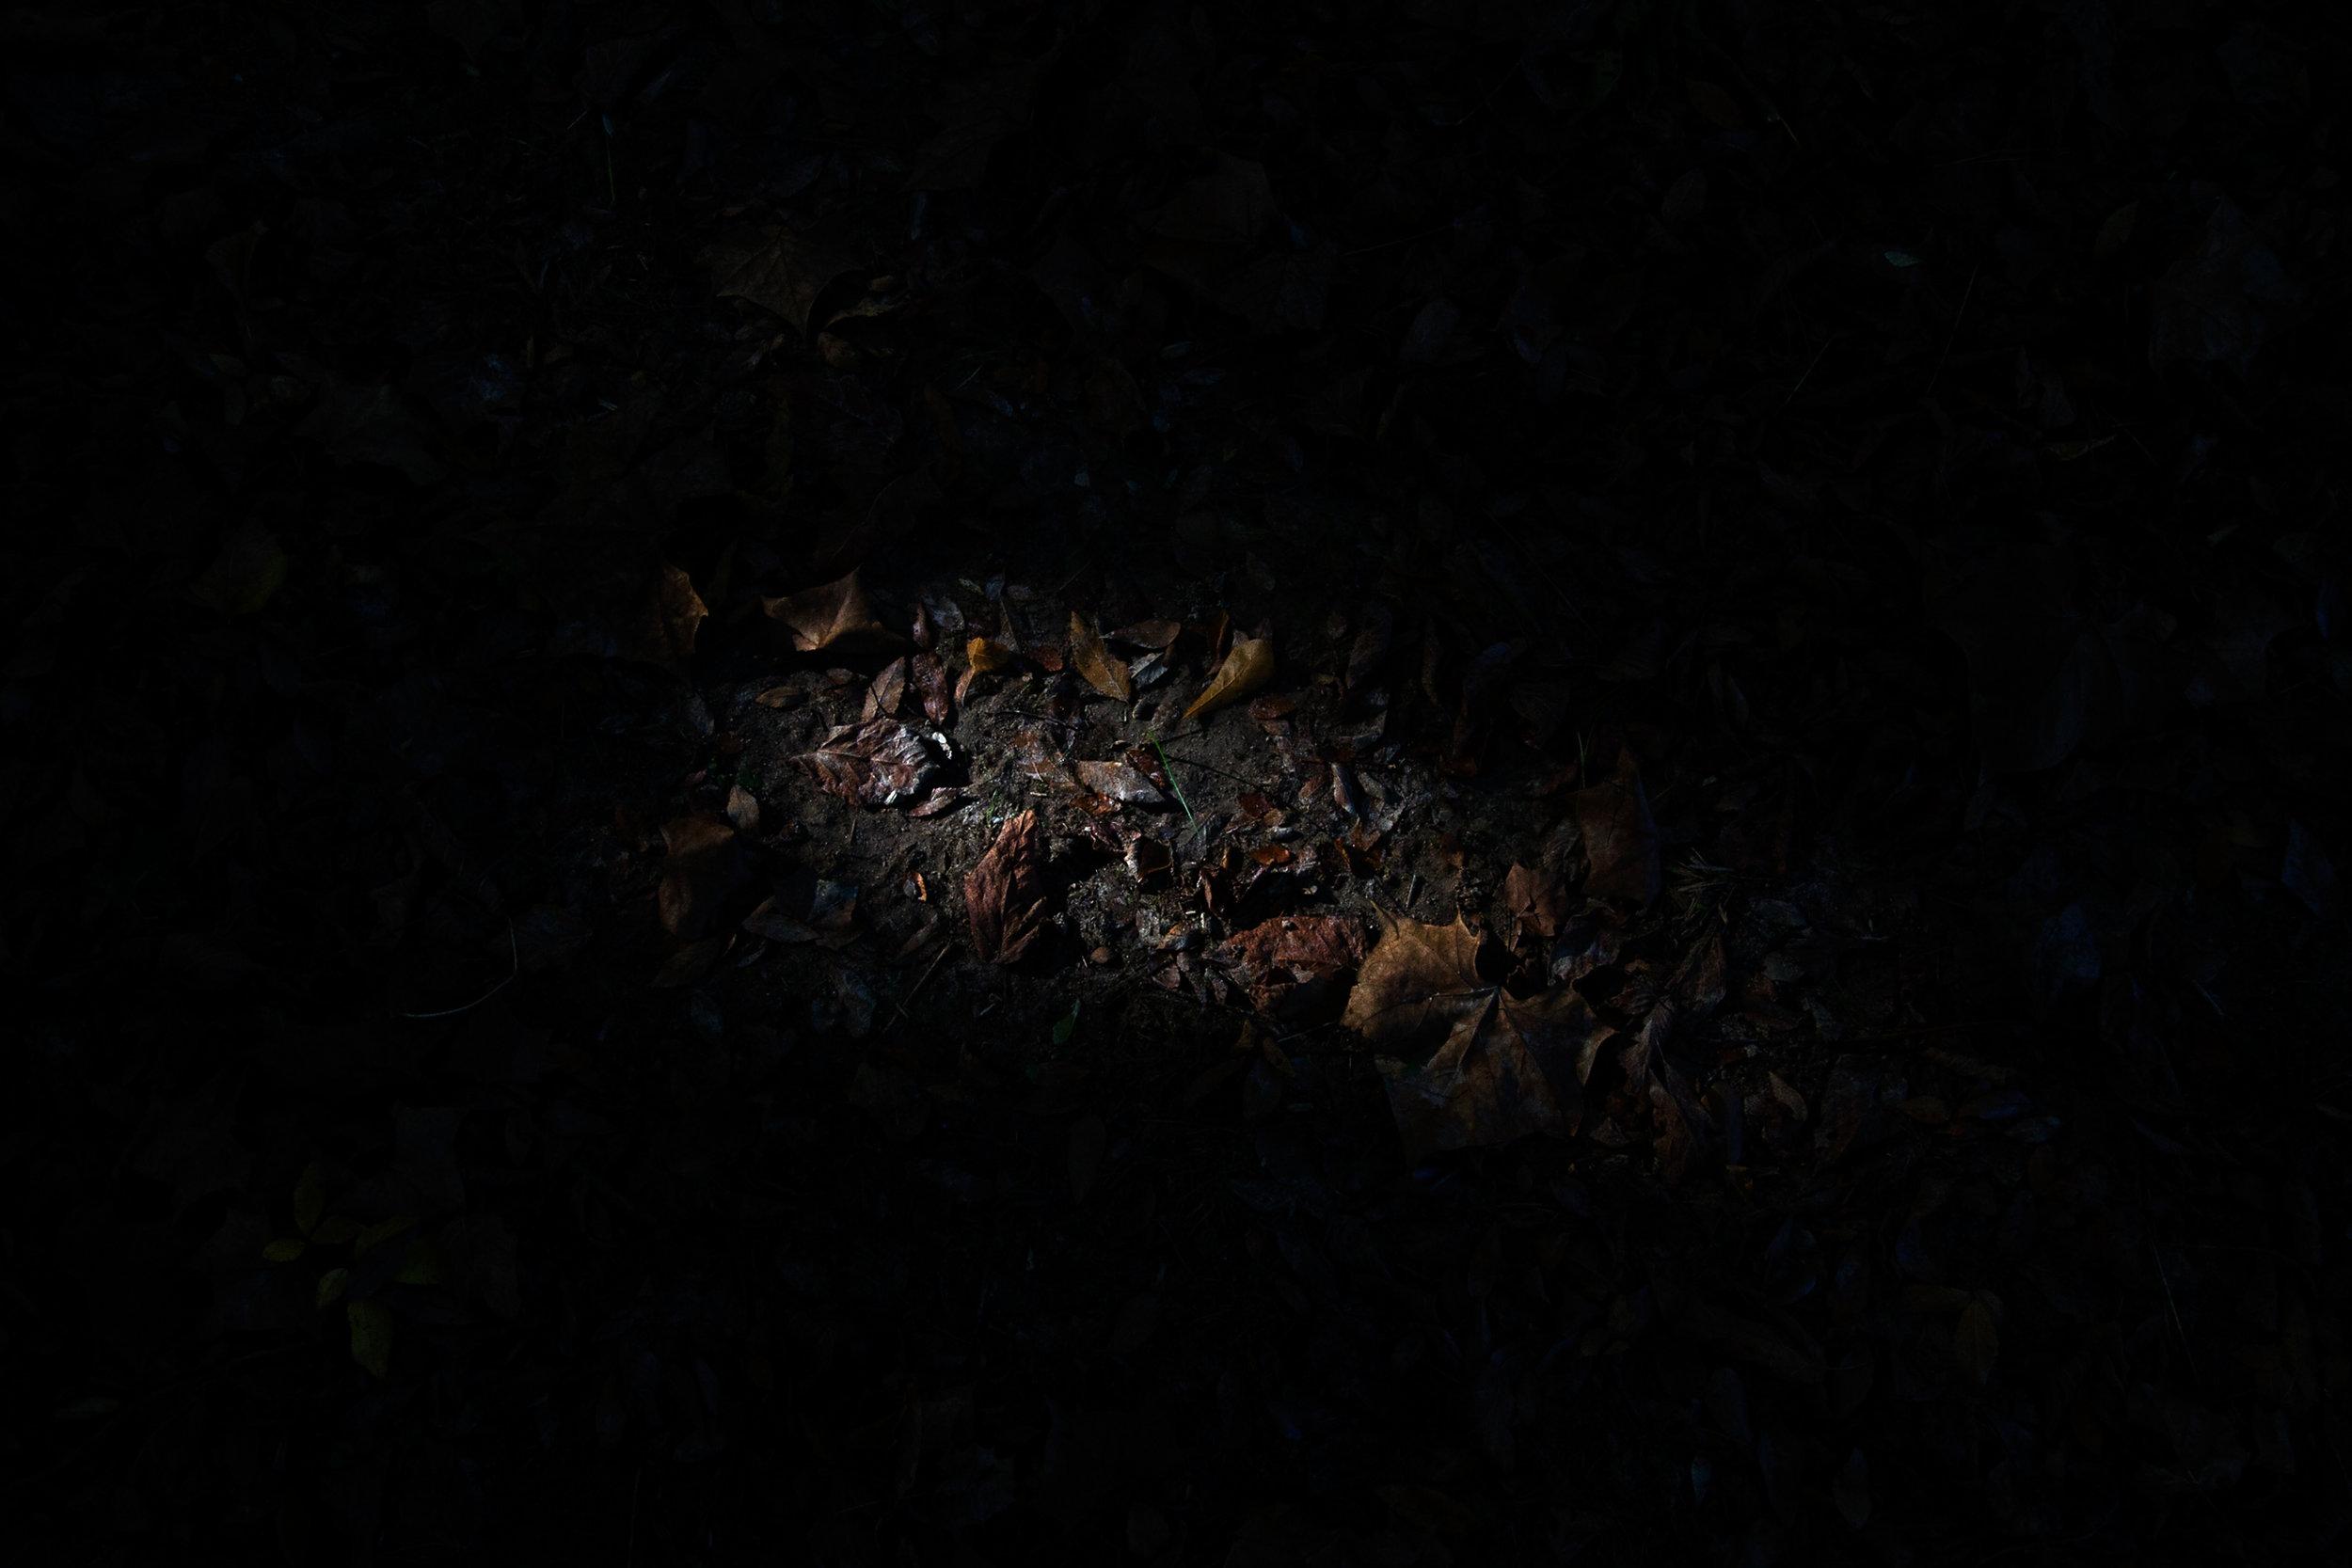 Light_leaf-1-5.jpg